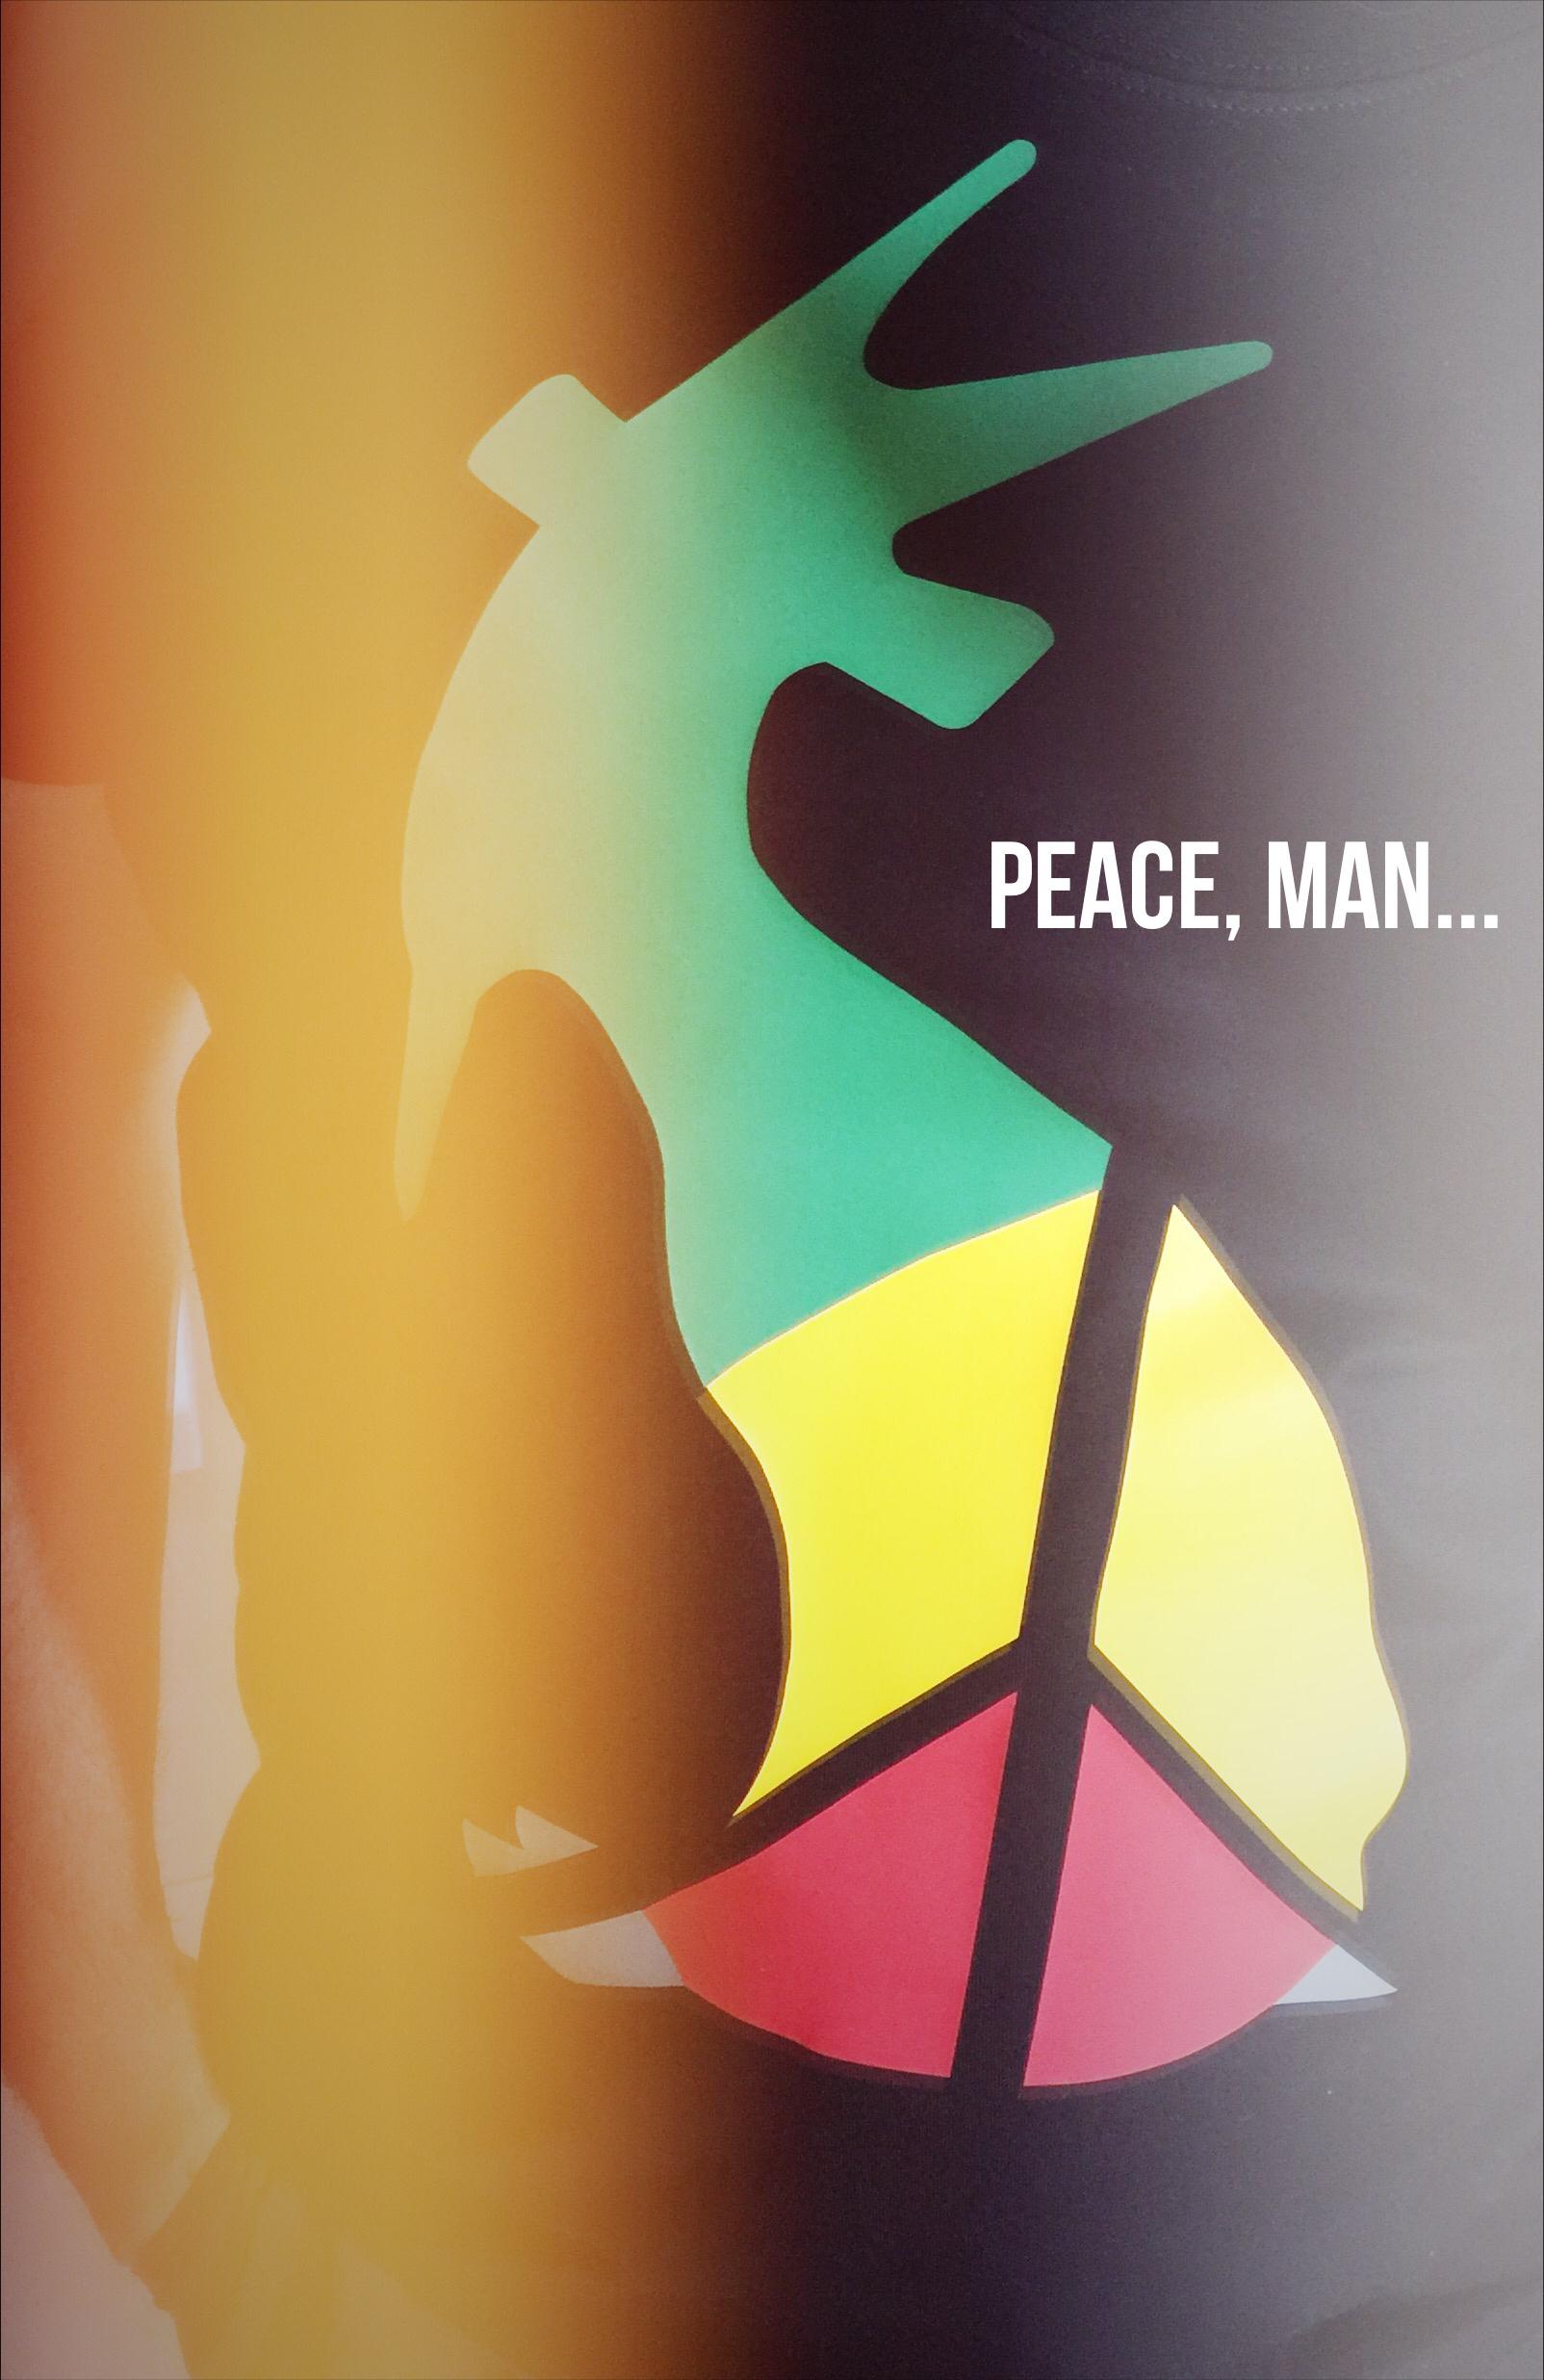 peace . kozly.net